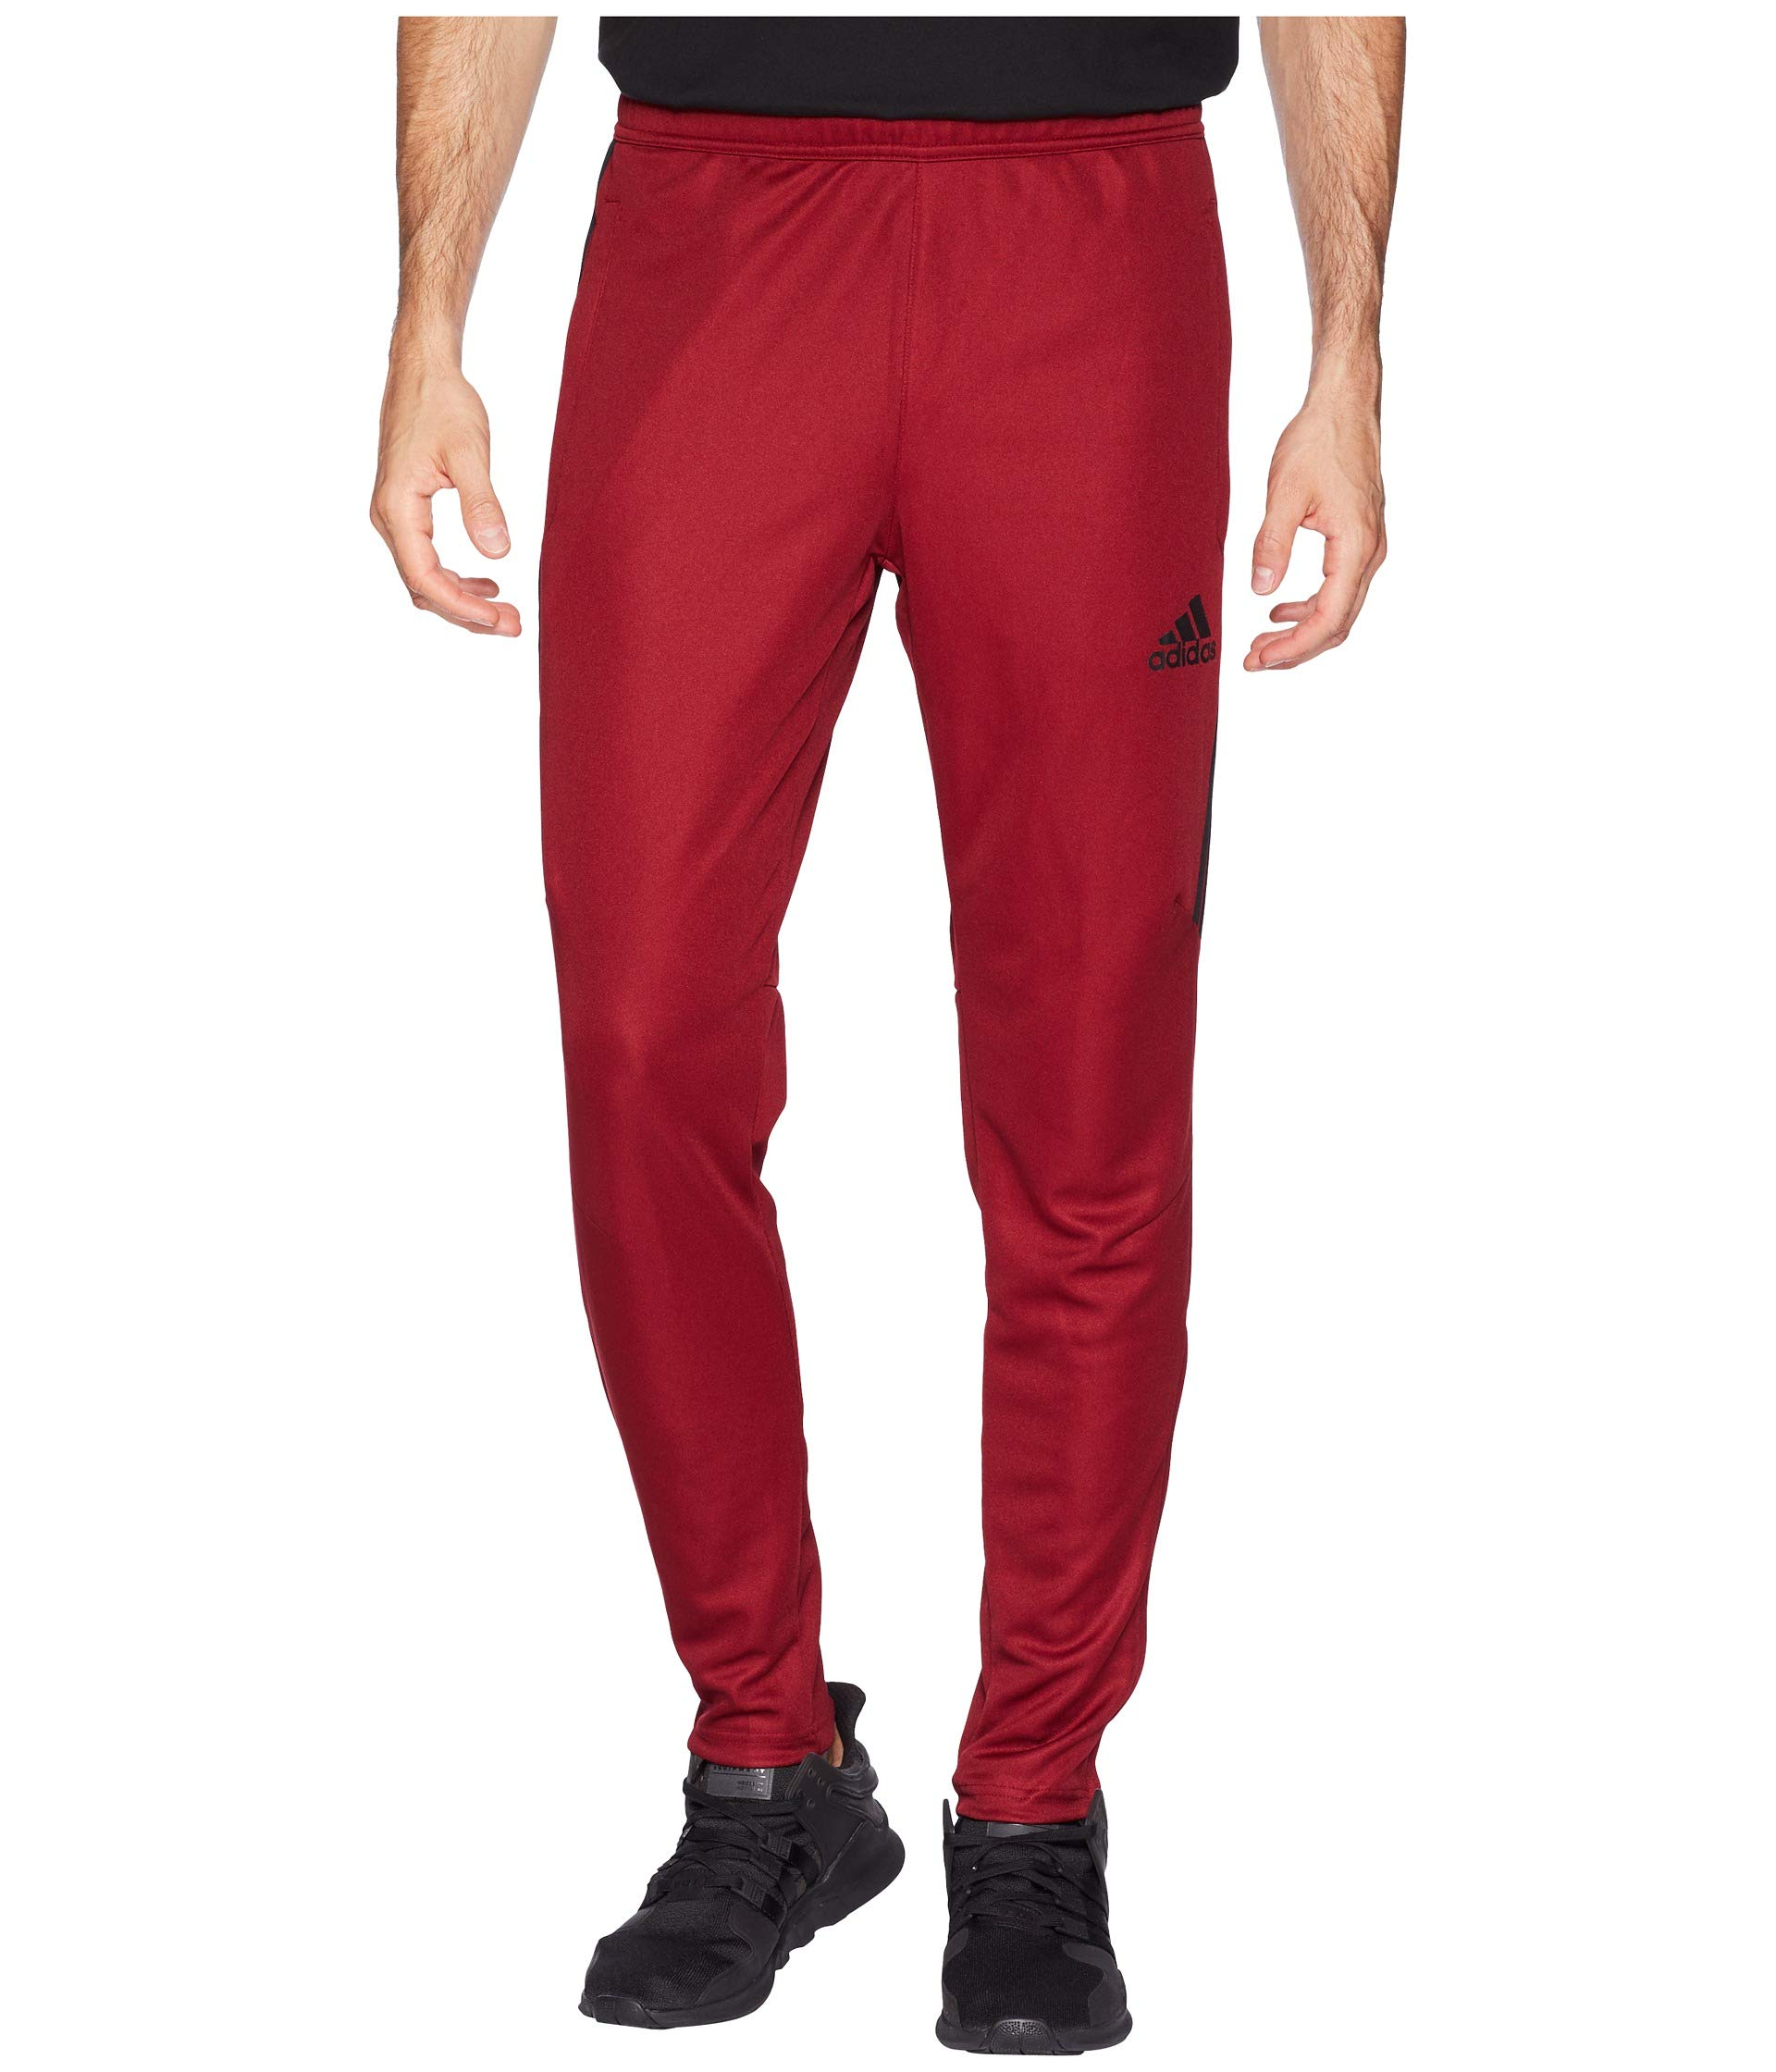 adidas Men's Tiro '17 Pants Collegiate Burgundy/Black Medium 31 by adidas